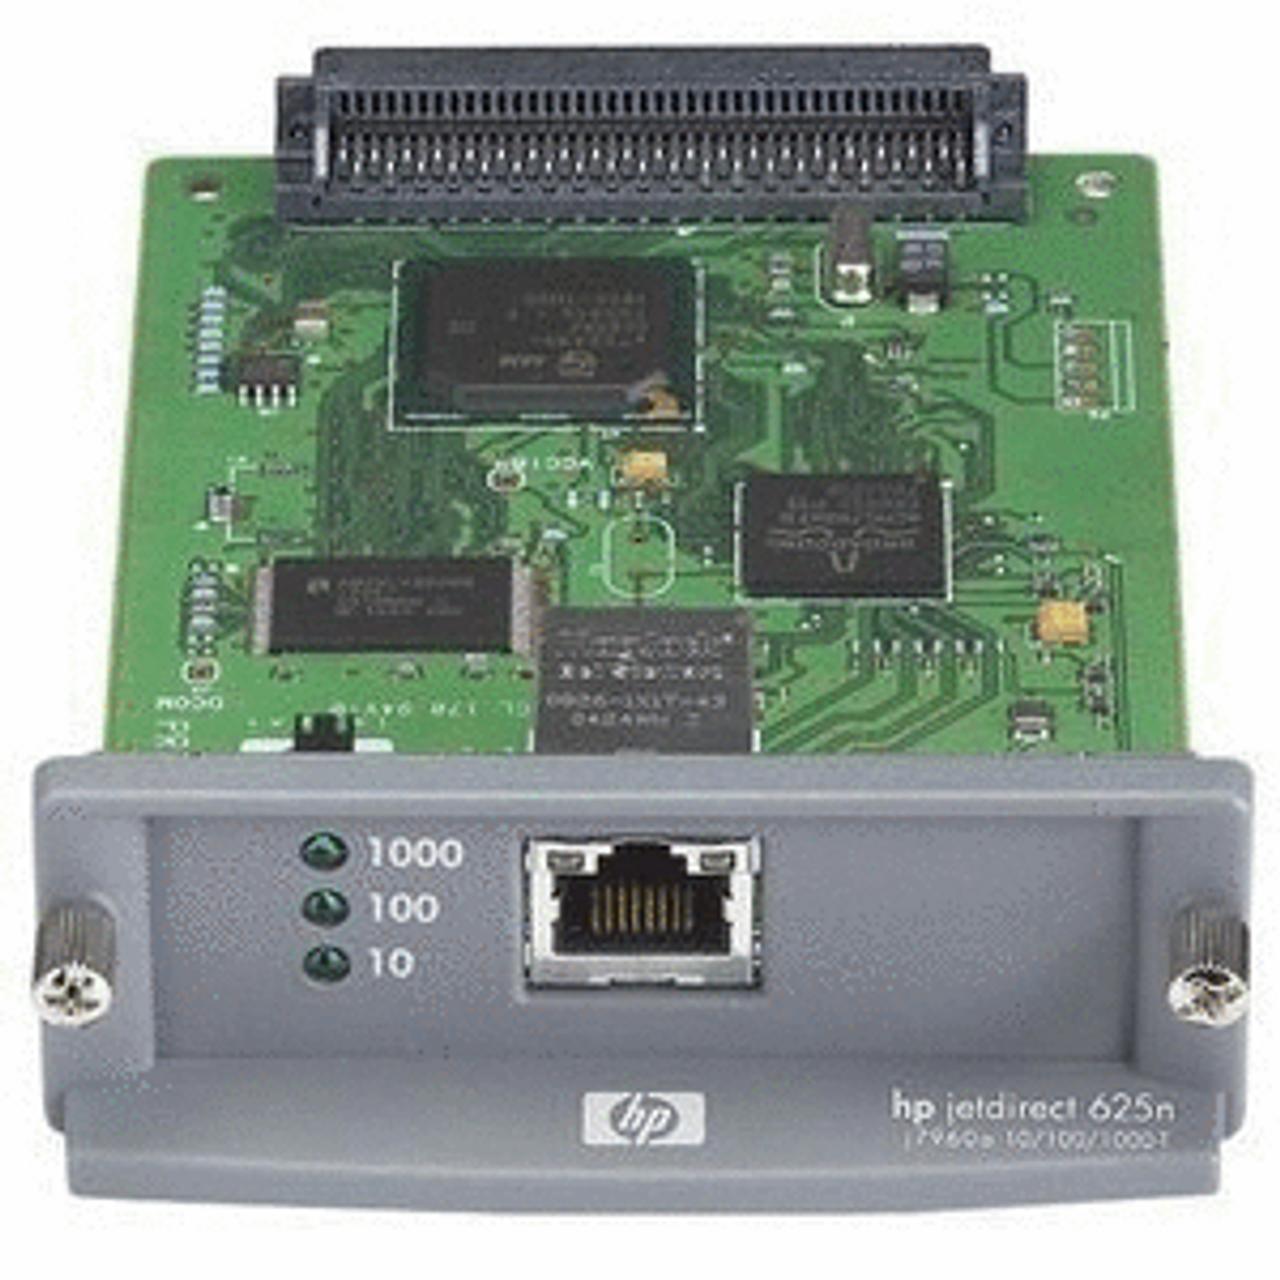 HP JetDirect 625n Print server - EIO